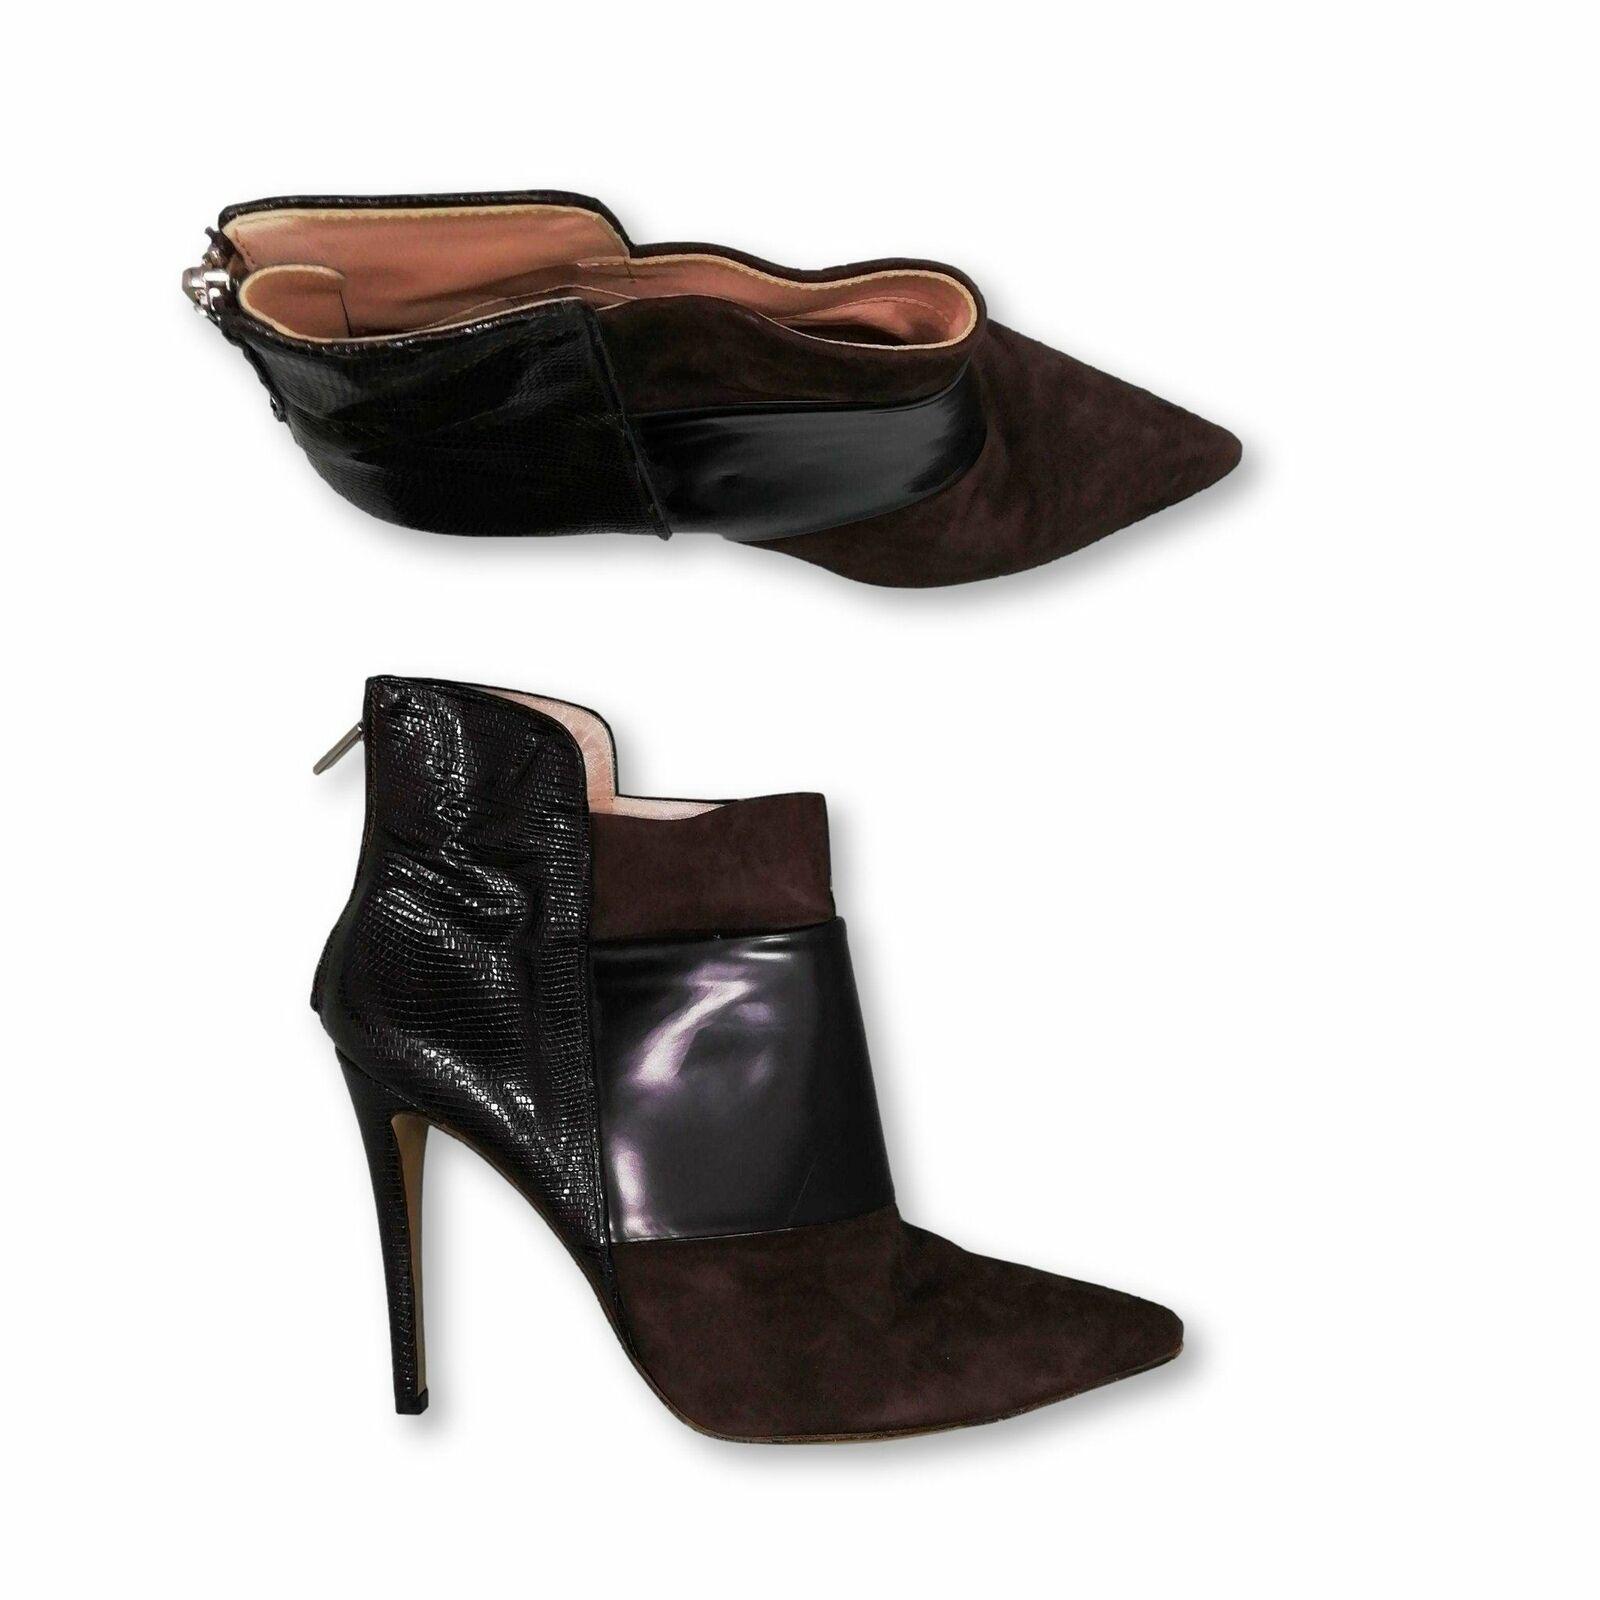 Nicole Farhi Women's Heels Size EU 41 UK 8 Colour: Brown